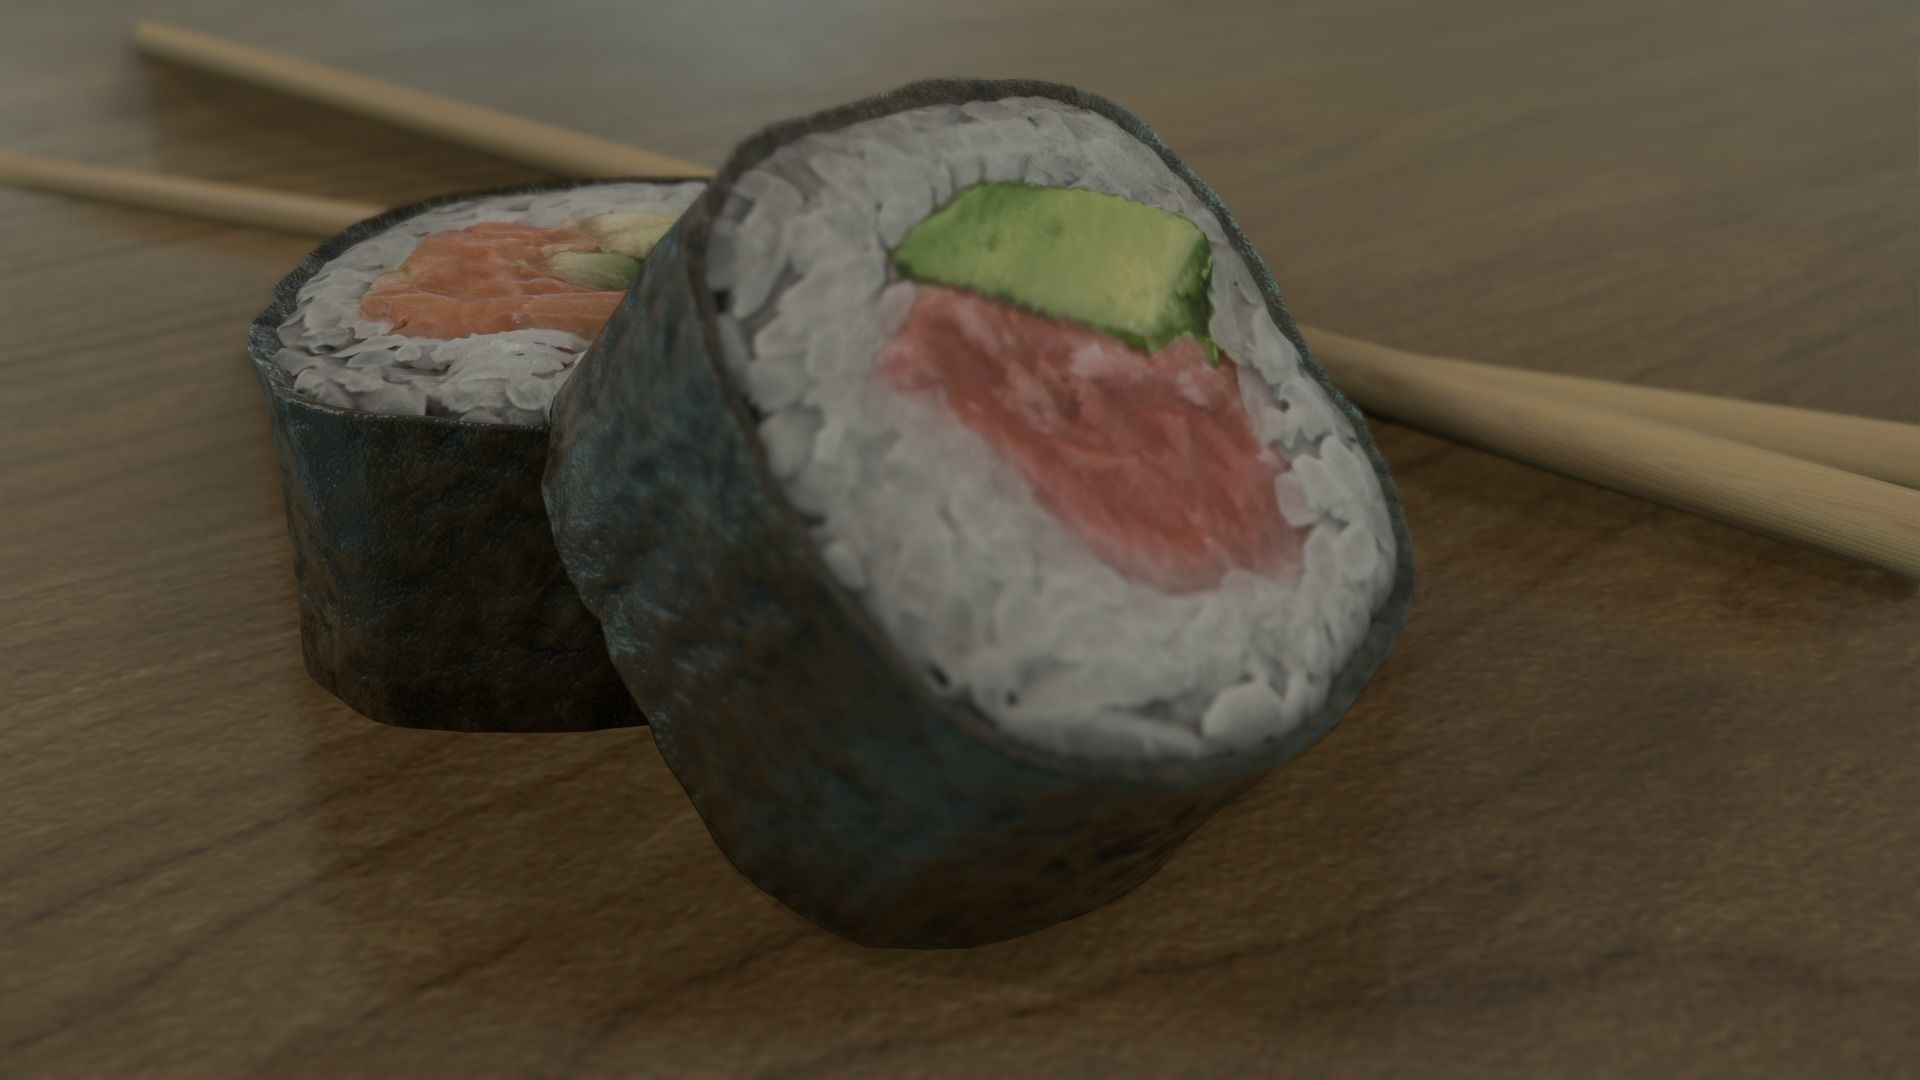 Sushi Rolls and Chopsticks